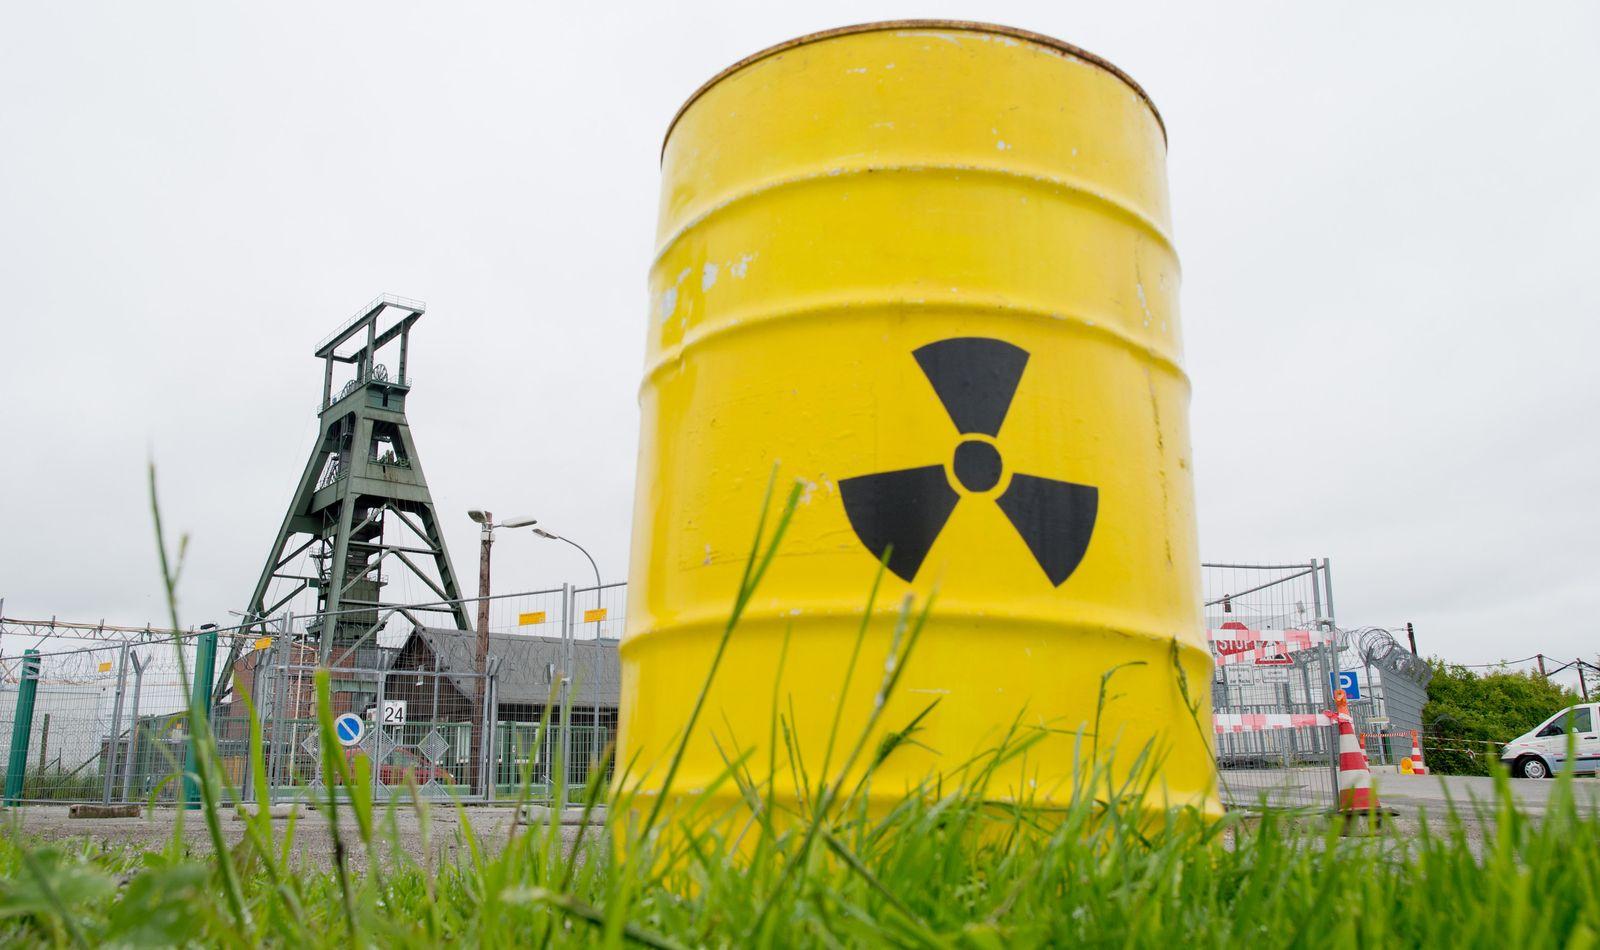 Atomendlager Schacht Konrad